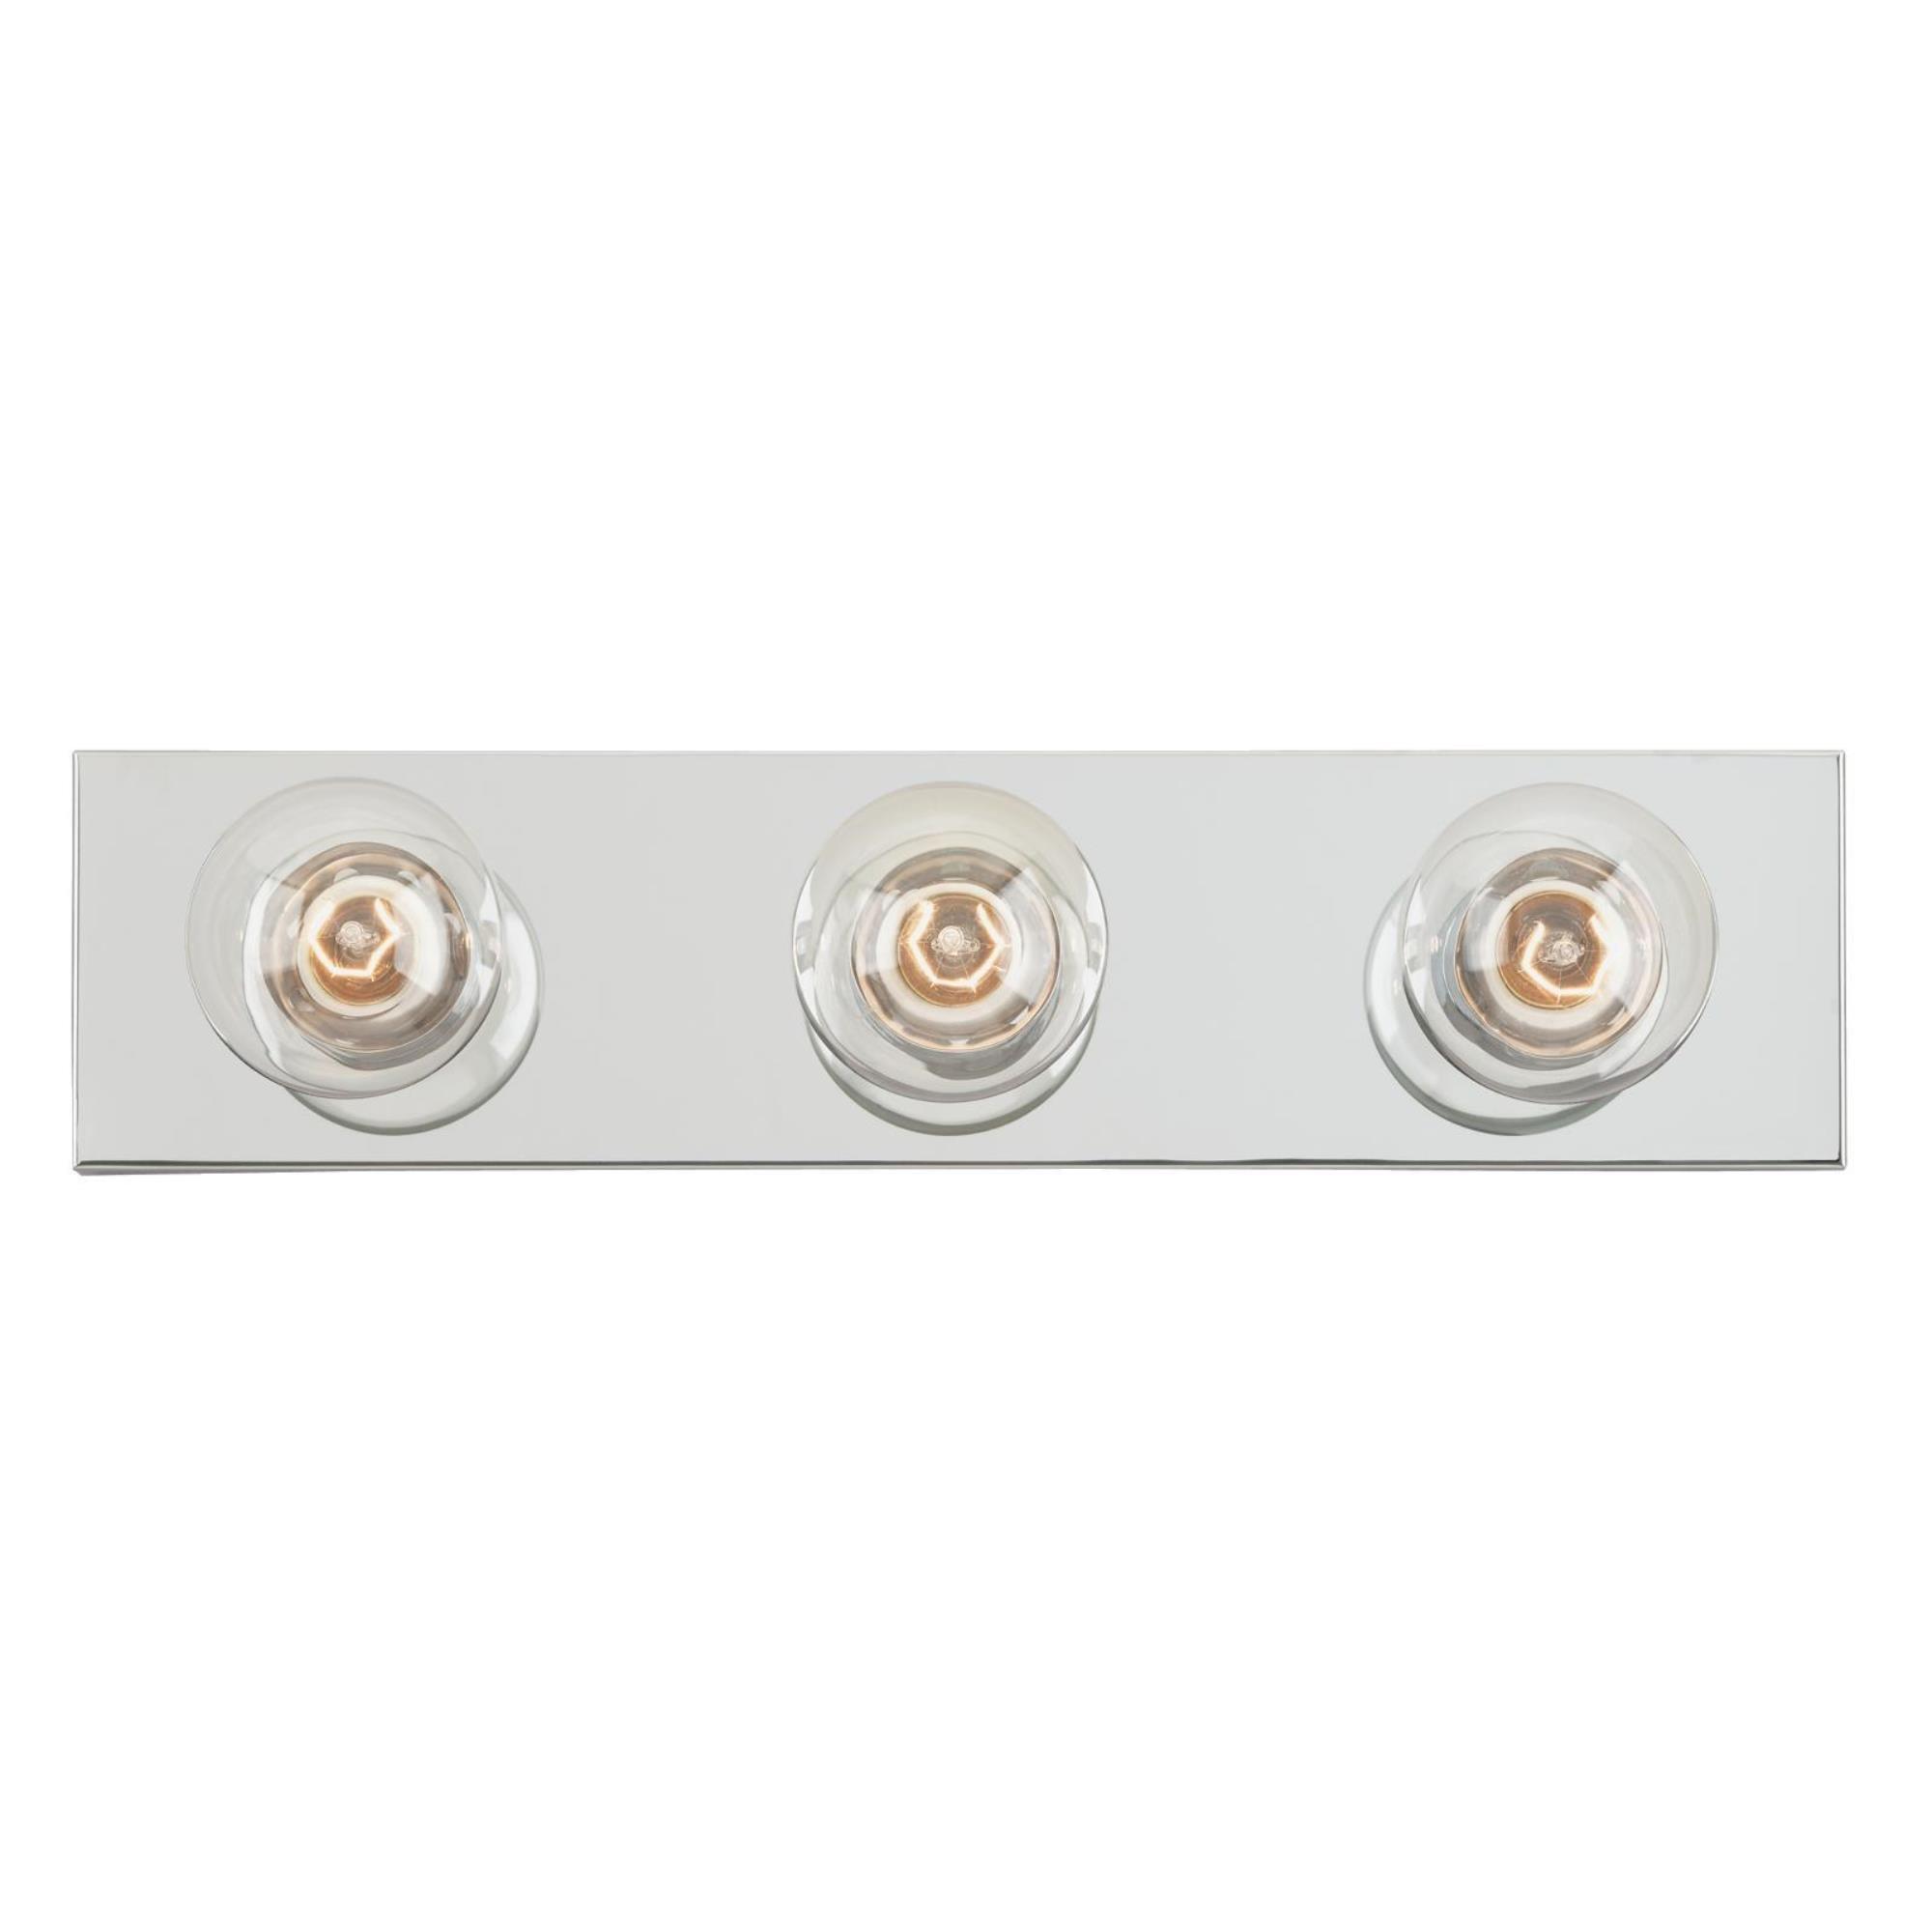 Westinghouse Lighting 6640600 Three Light Interior Bath Bar Chrome Finish Vanity Lighting Fixtures Amazon Com